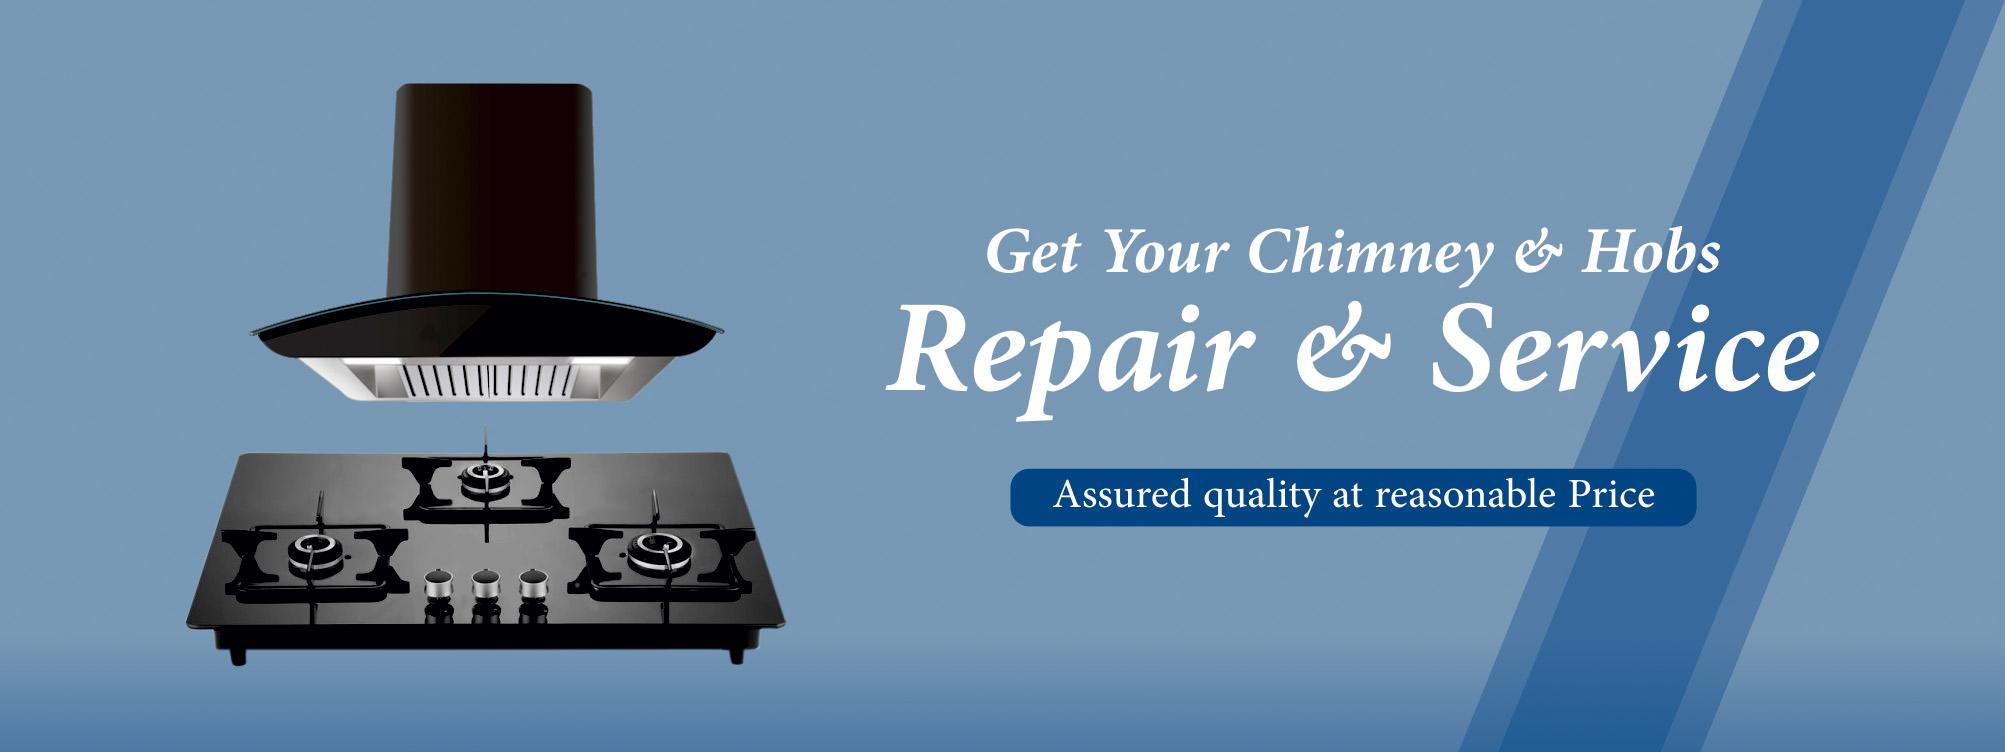 Dhanyashree enterprises chimney services